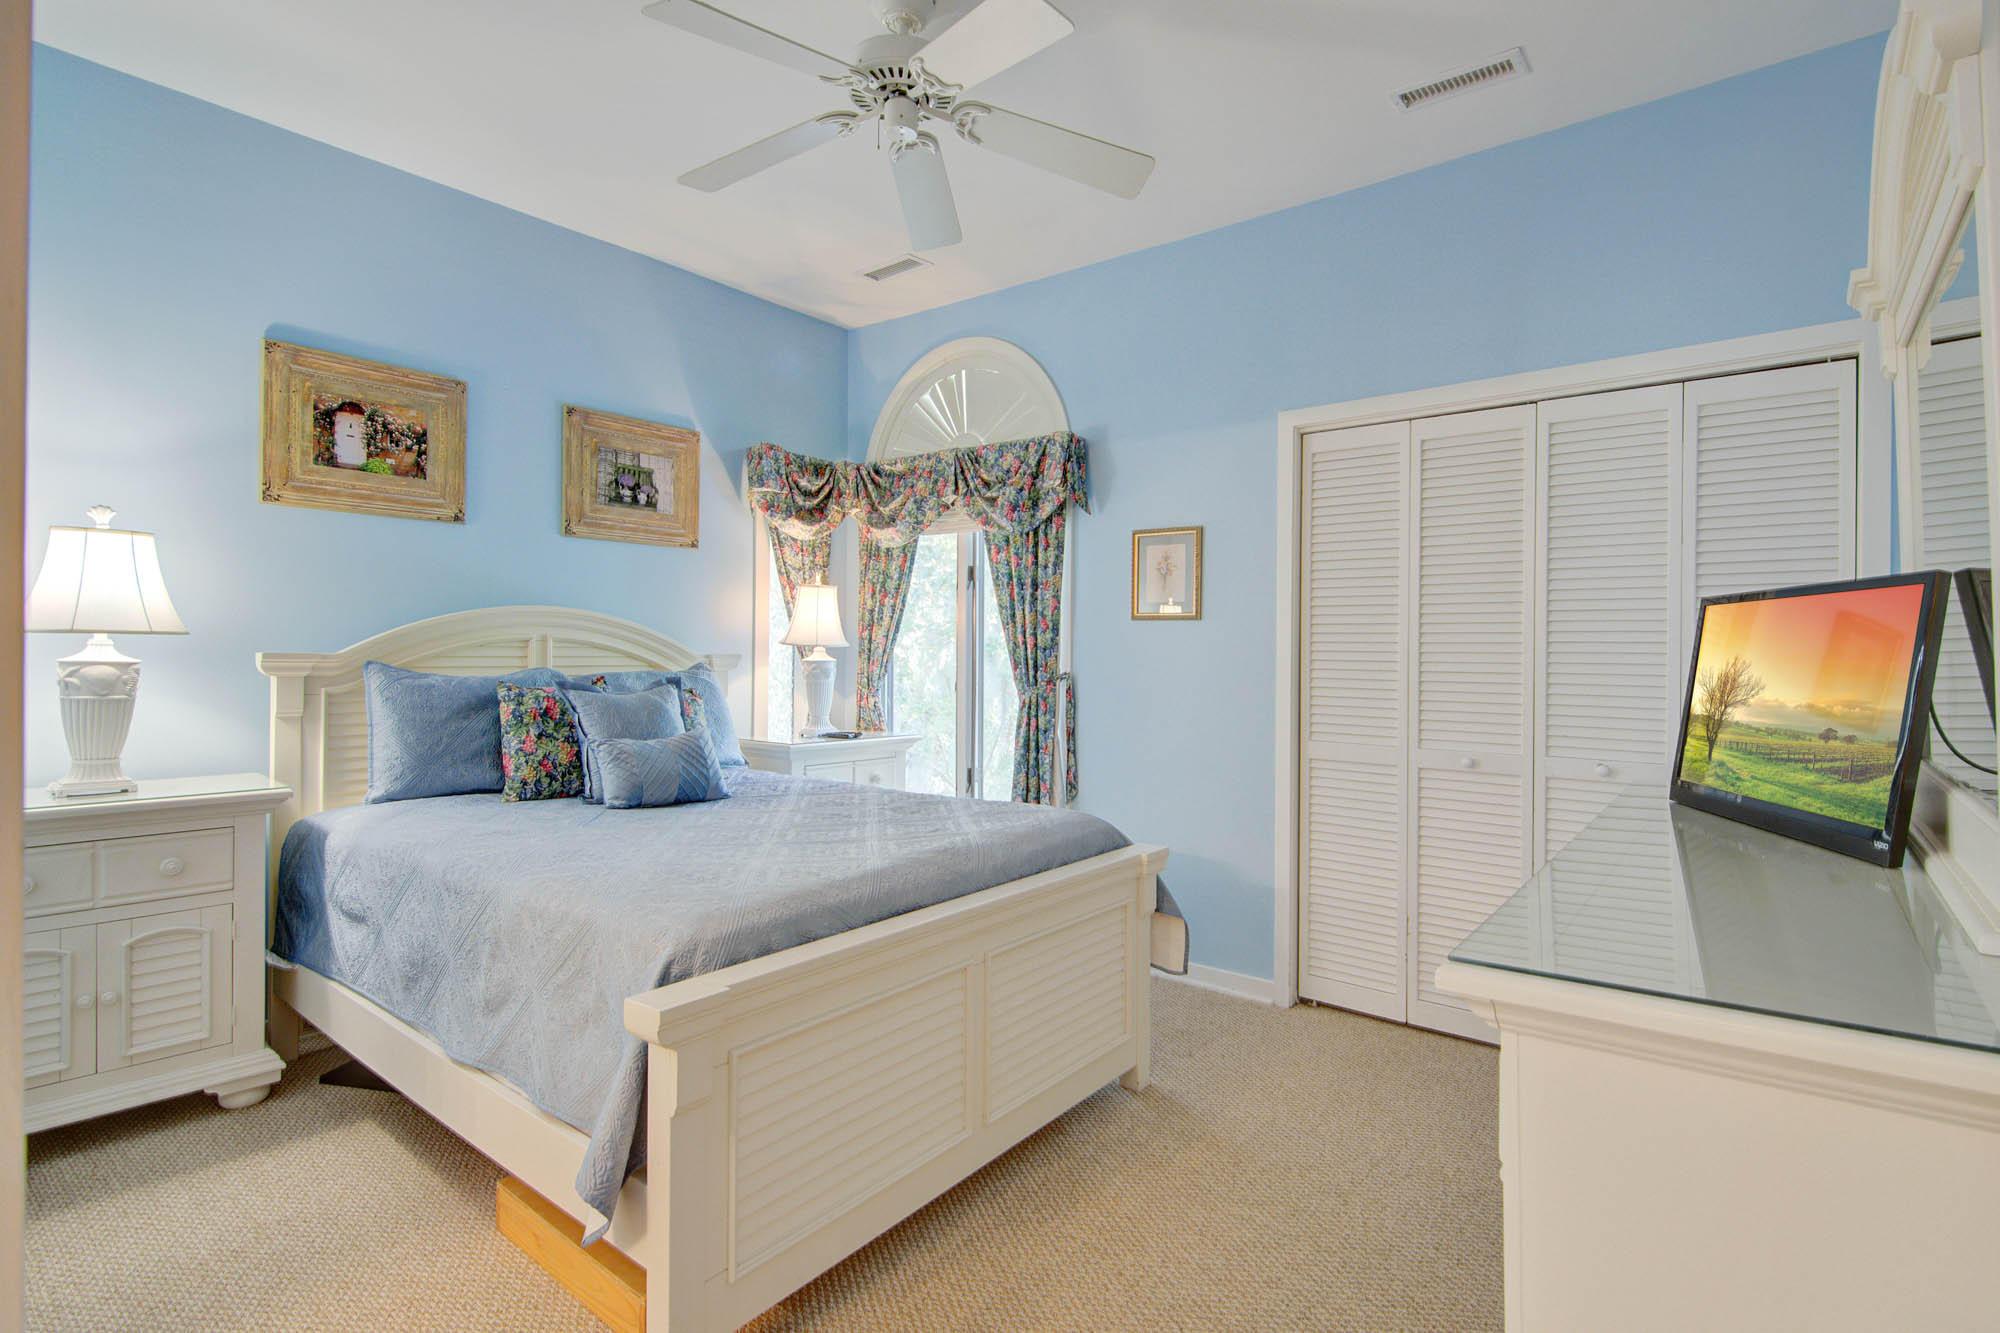 Kiawah Island Homes For Sale - 4504 Park Lake, Kiawah Island, SC - 10